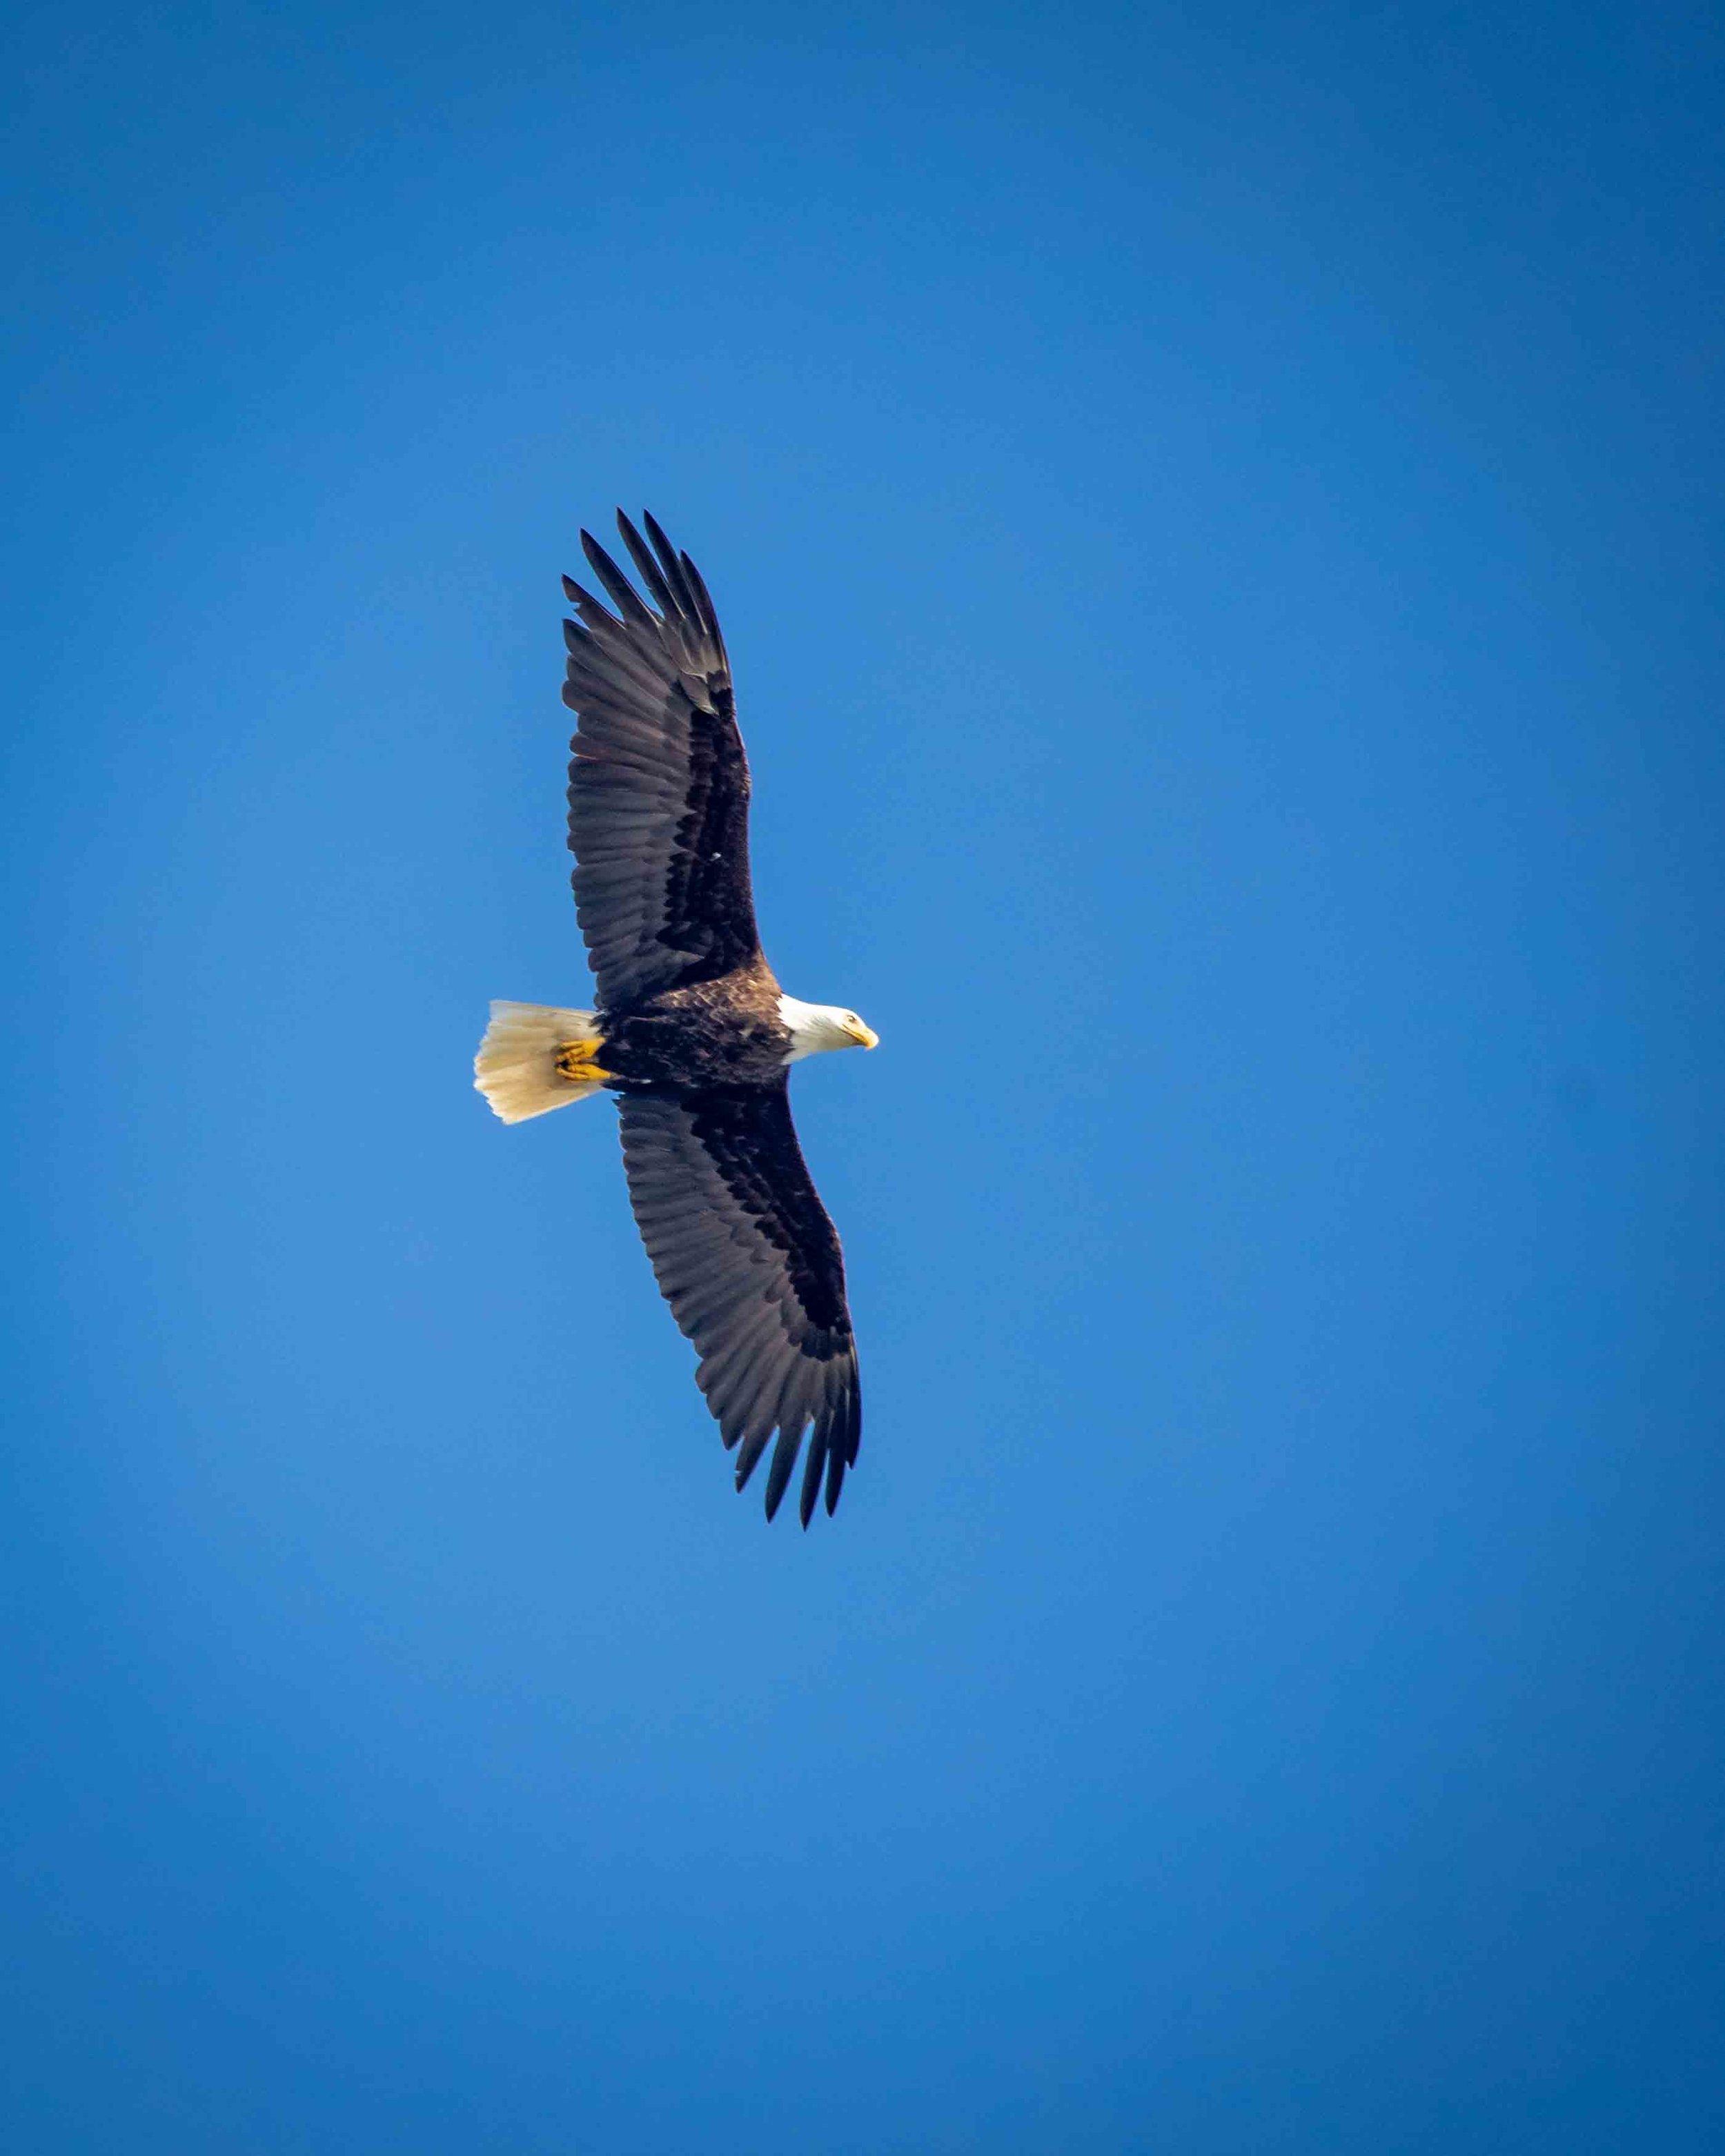 Bald Eagles at Rialto Beach - Olympic National Park Hikes